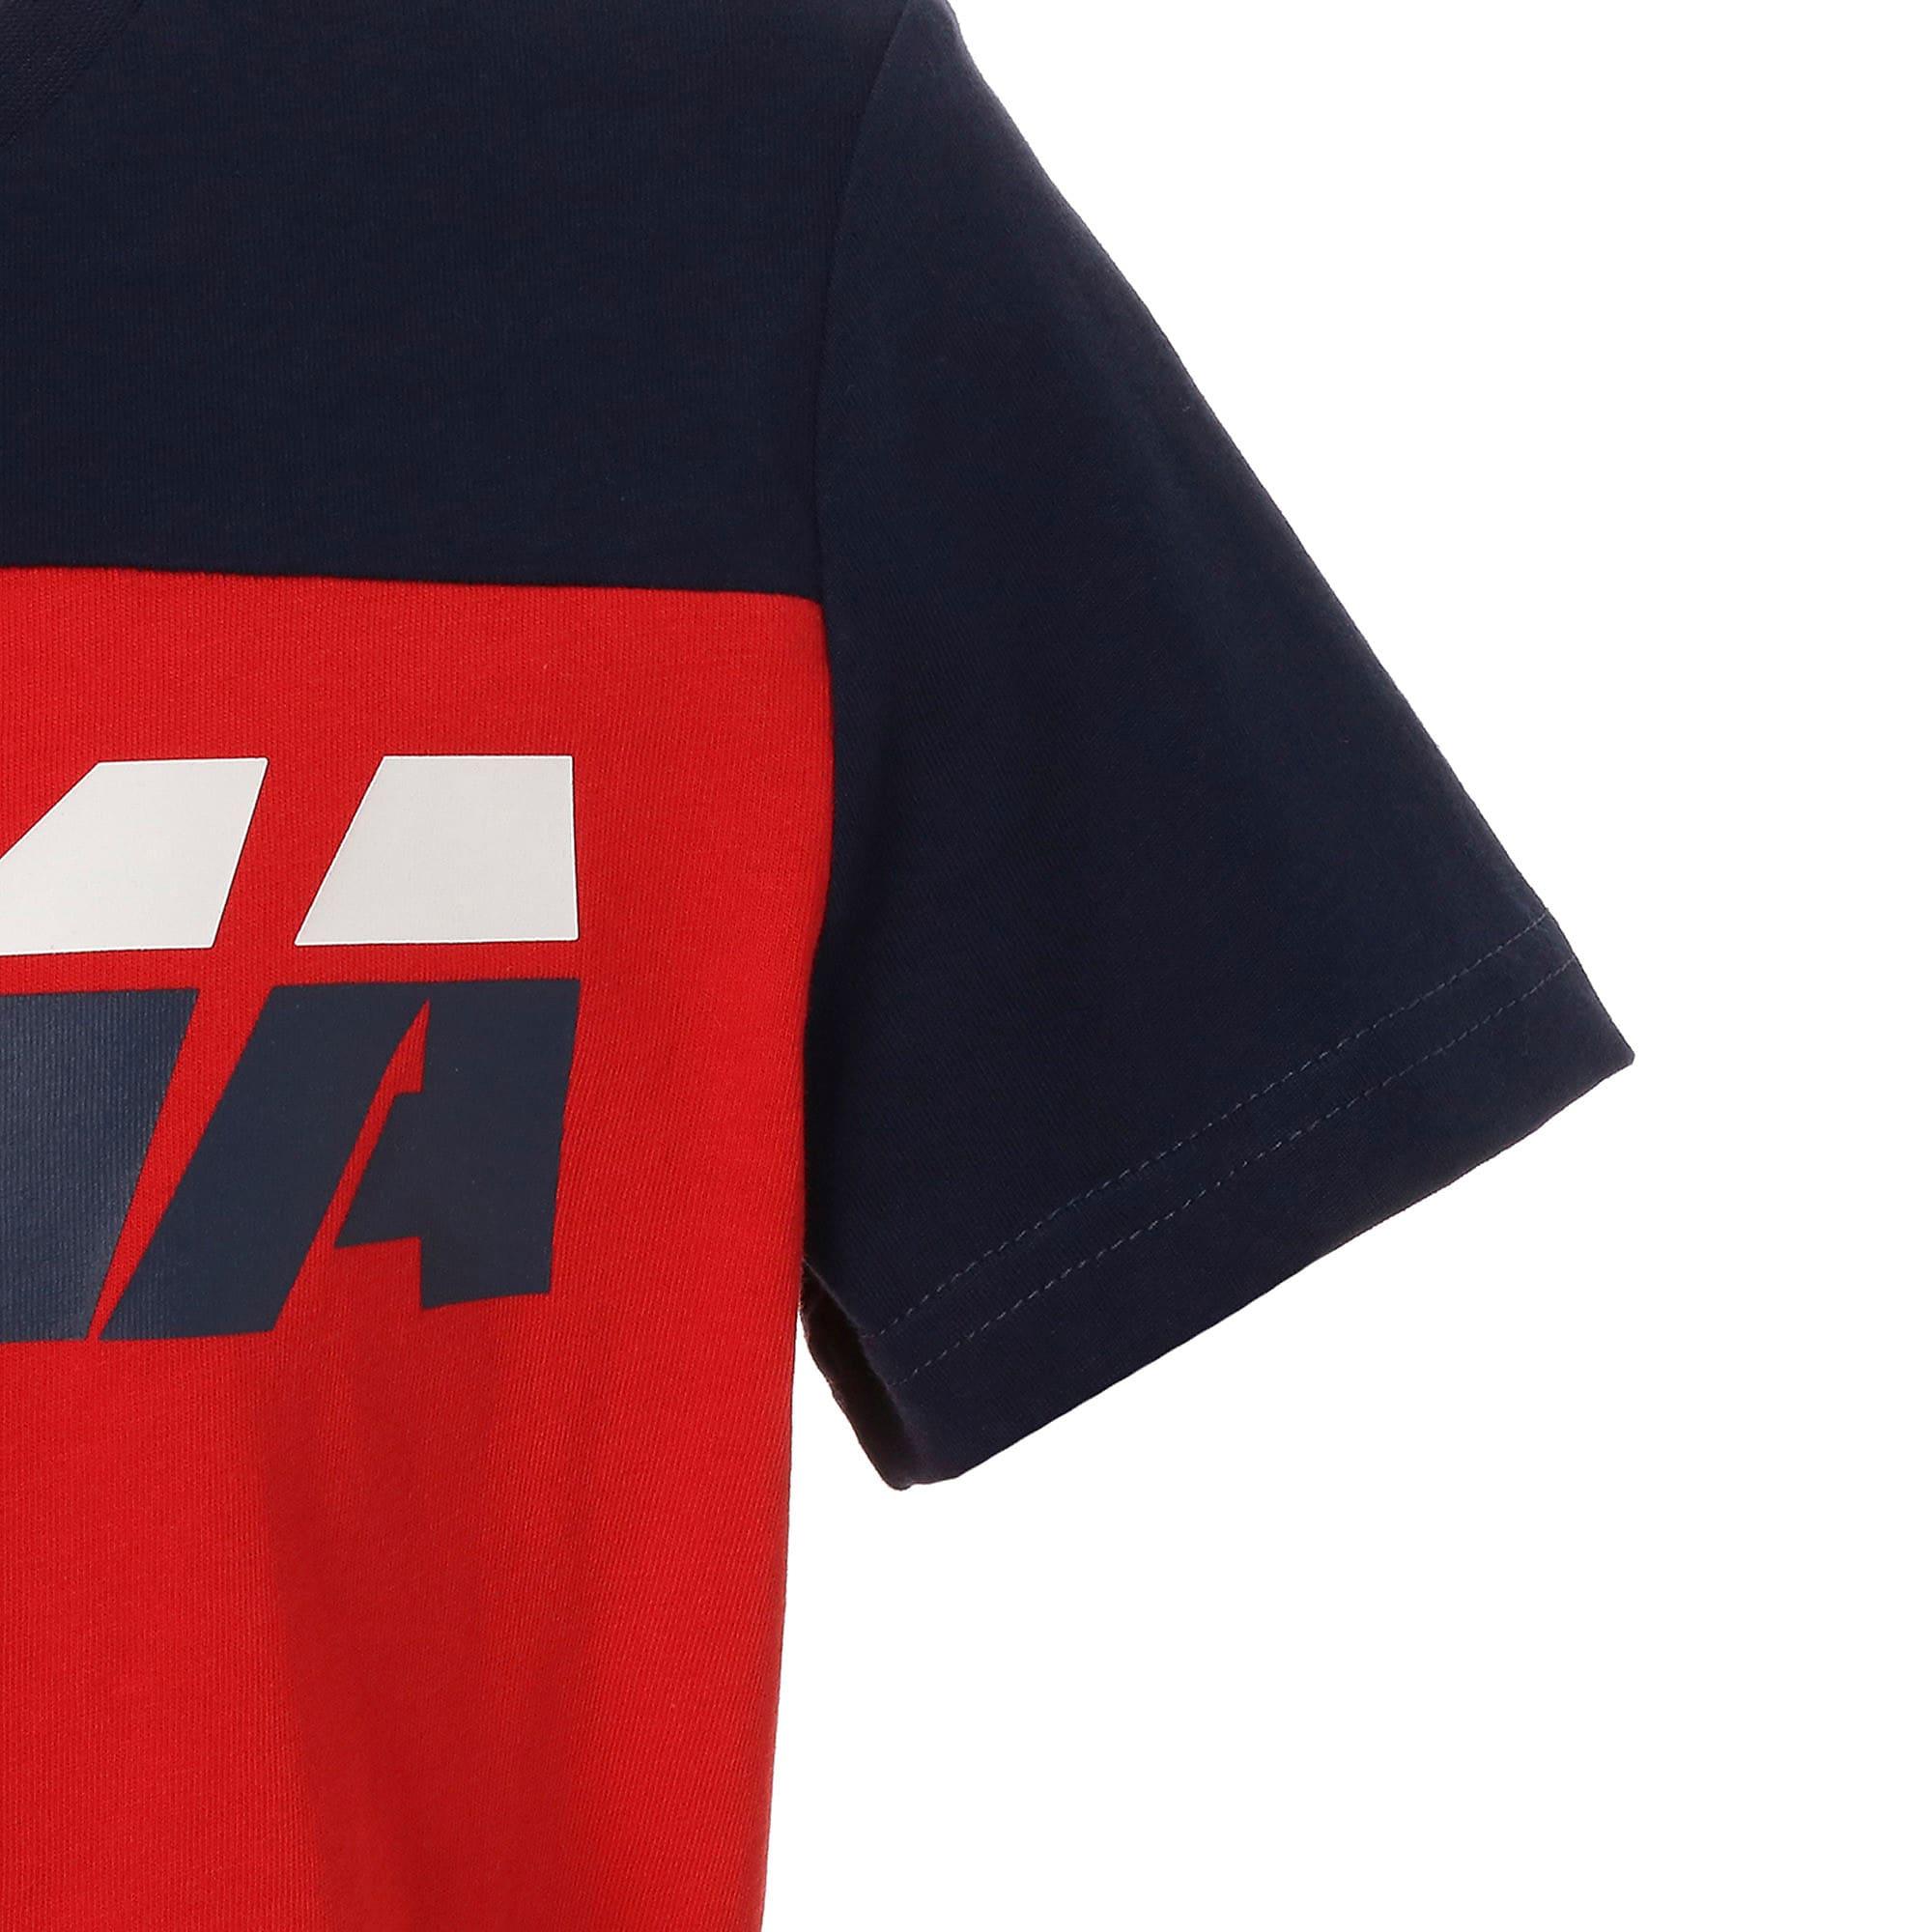 Thumbnail 5 of キッズ ALPHA SS トレンド Tシャツ 半袖, High Risk Red, medium-JPN